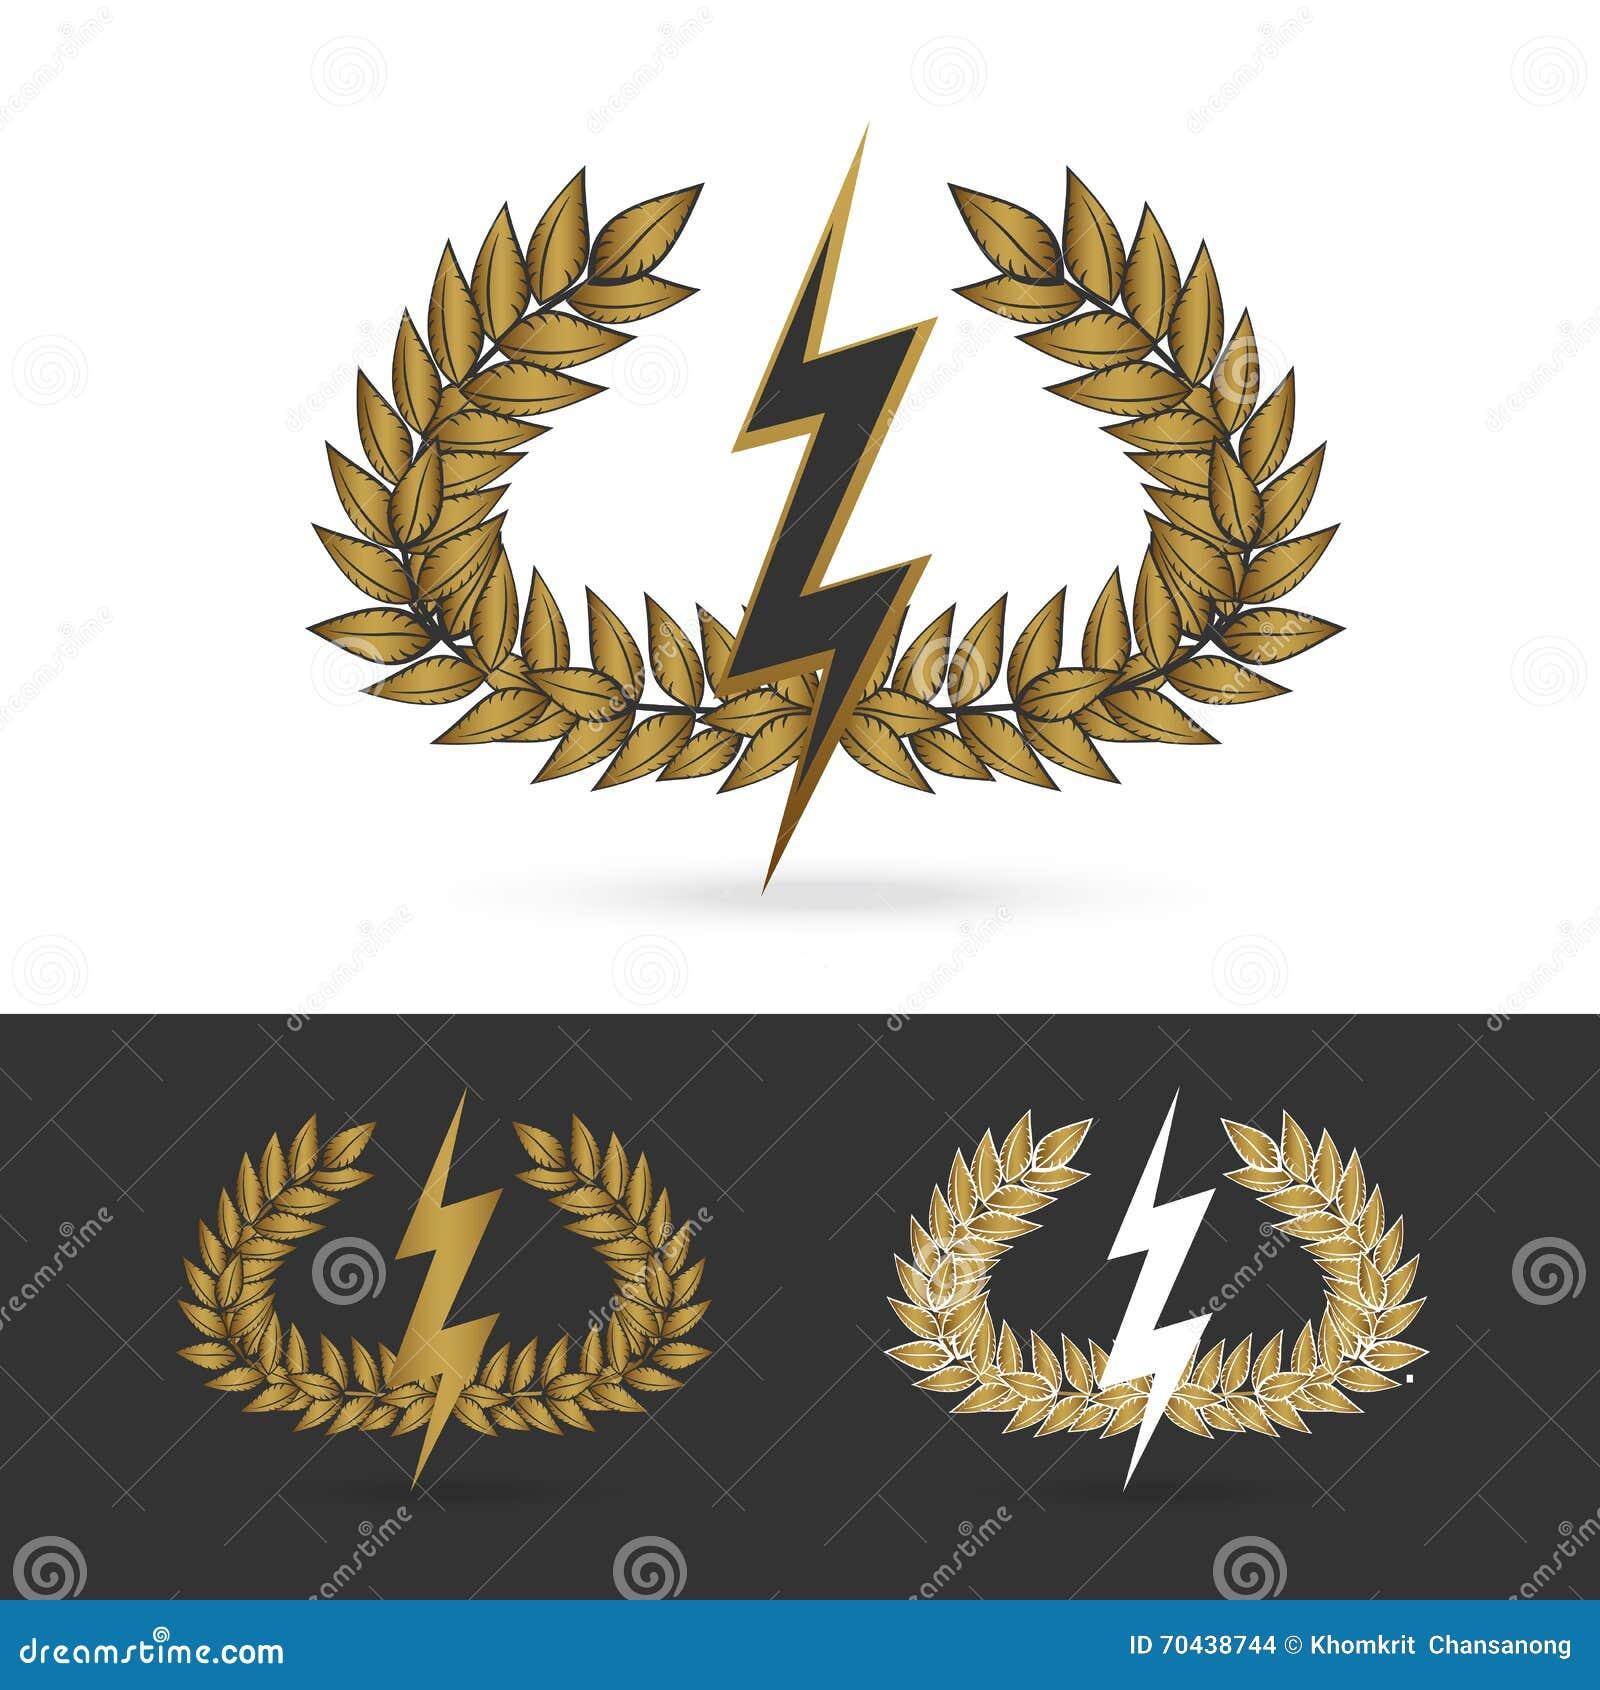 Greek god poseidon stock illustrations 149 greek god poseidon olive branch with thunder symbol of greek god zeus isolate olive branch with thunder symbol biocorpaavc